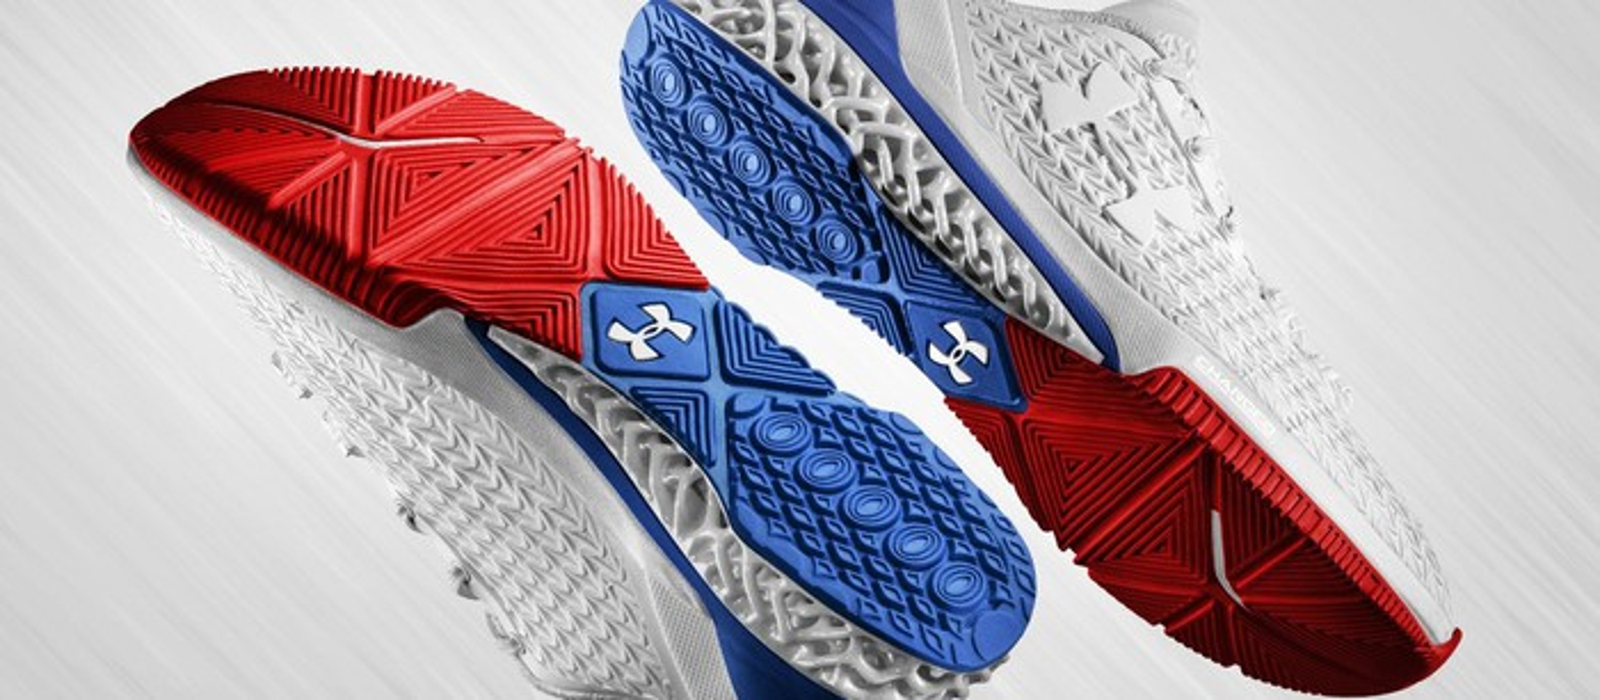 Under Armour's 3D printed shoe the Architech.